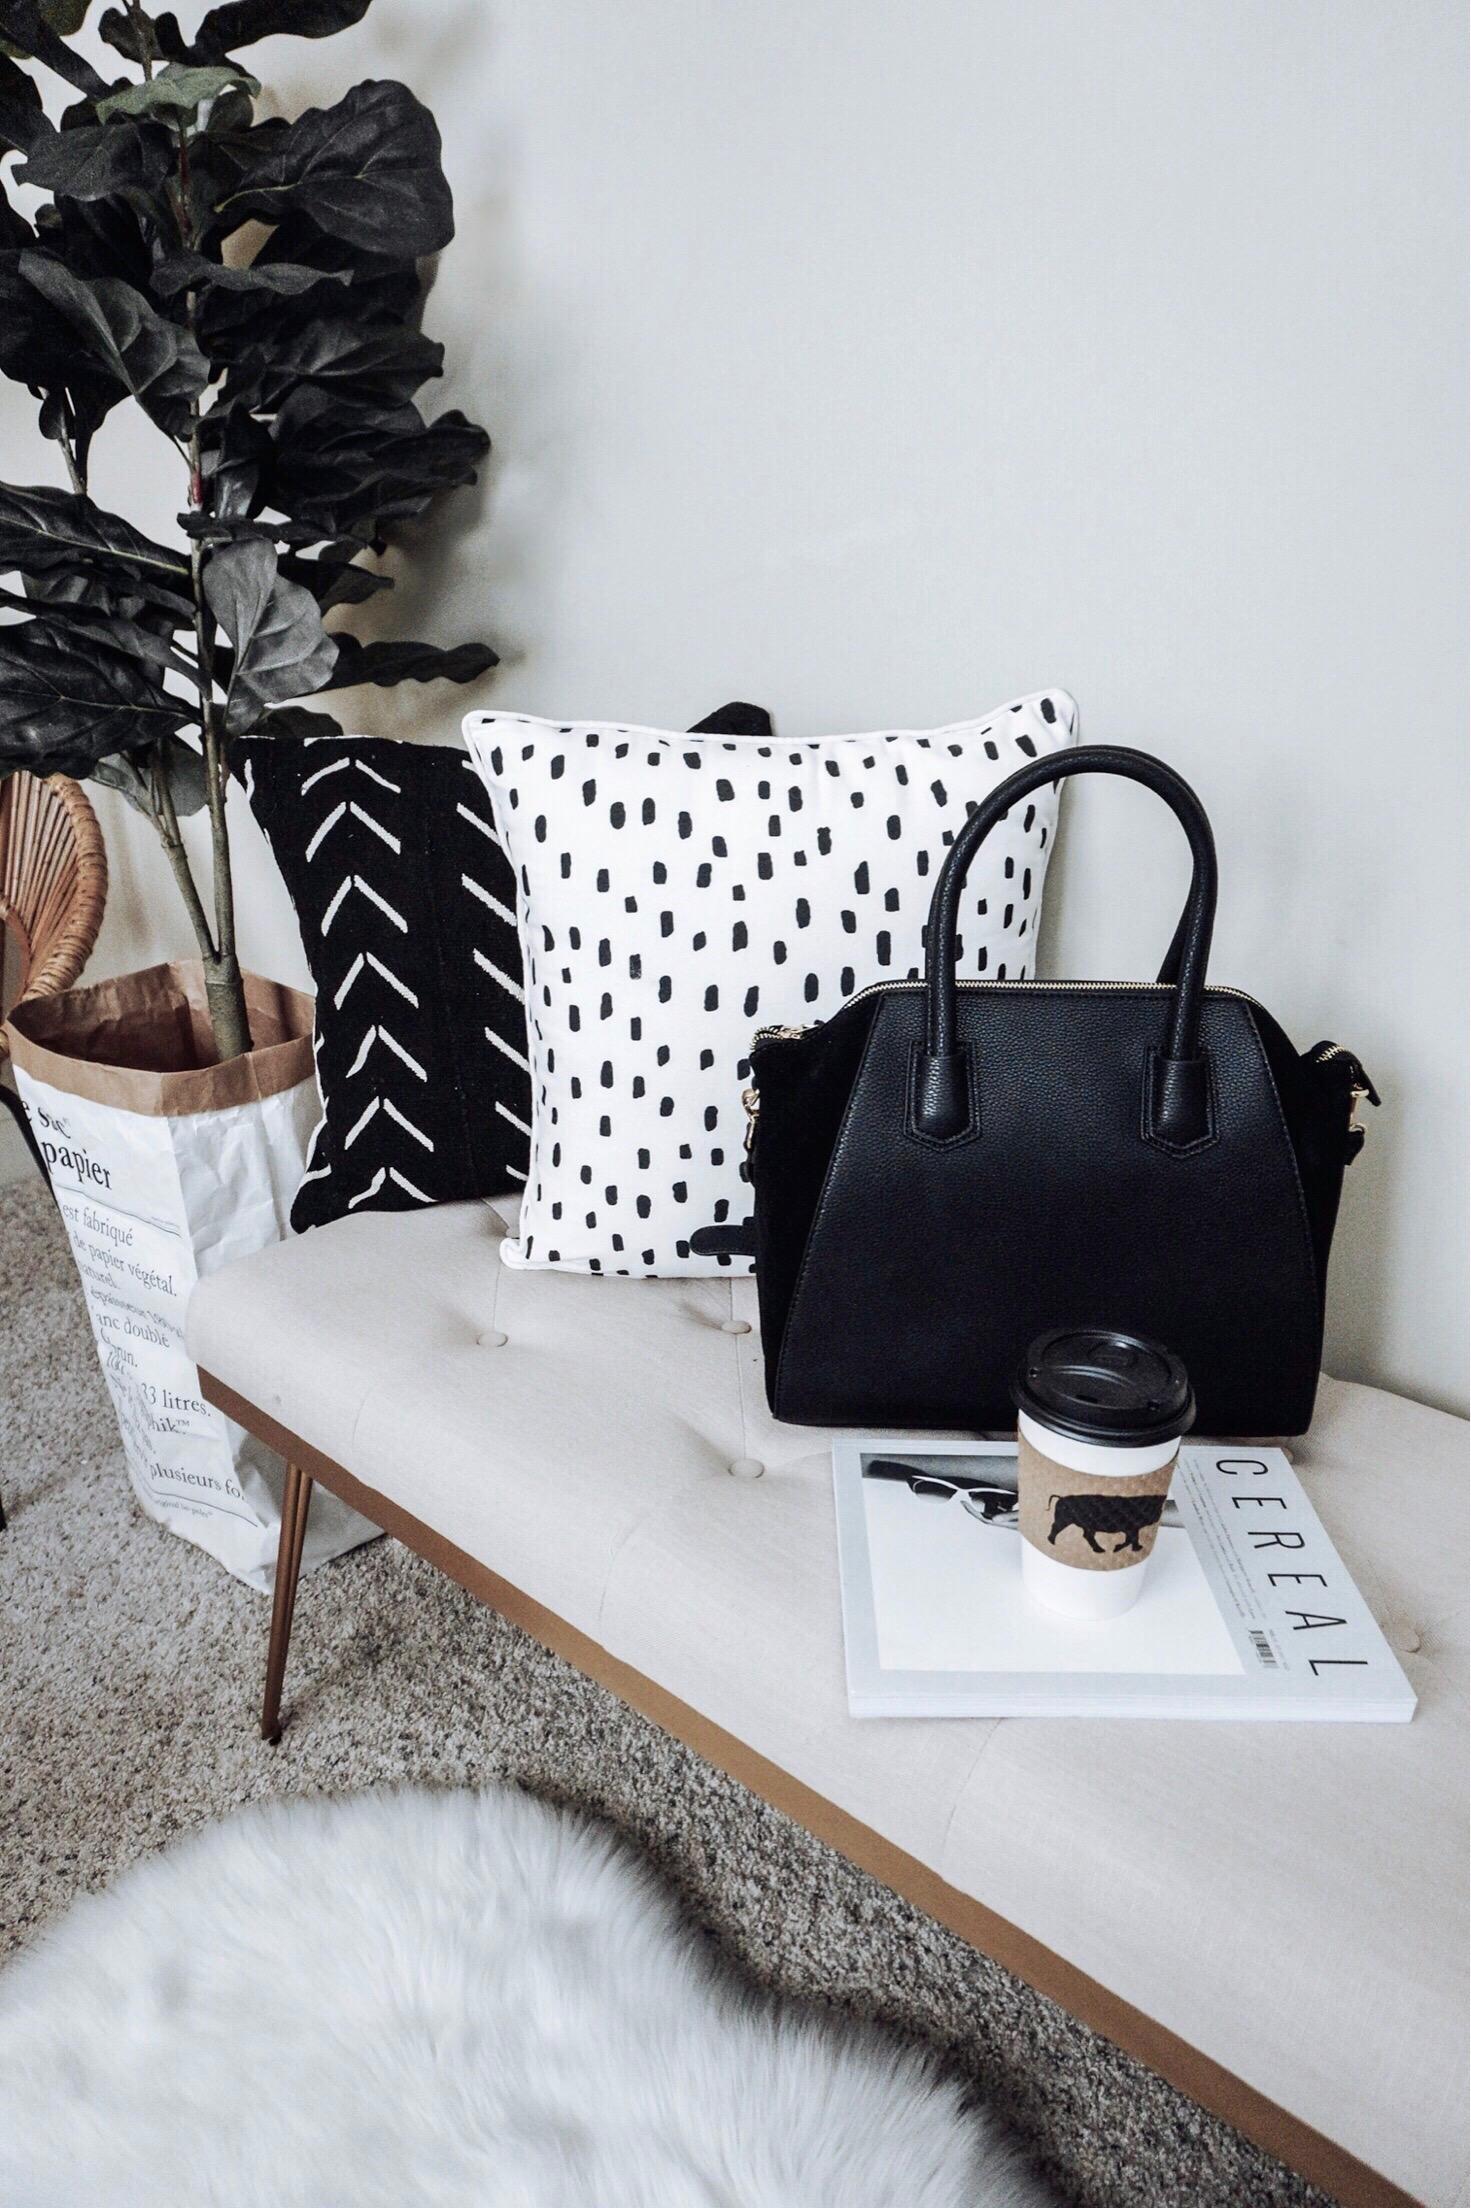 Tiffany Jais Houston fashion and lifestyle blogger |